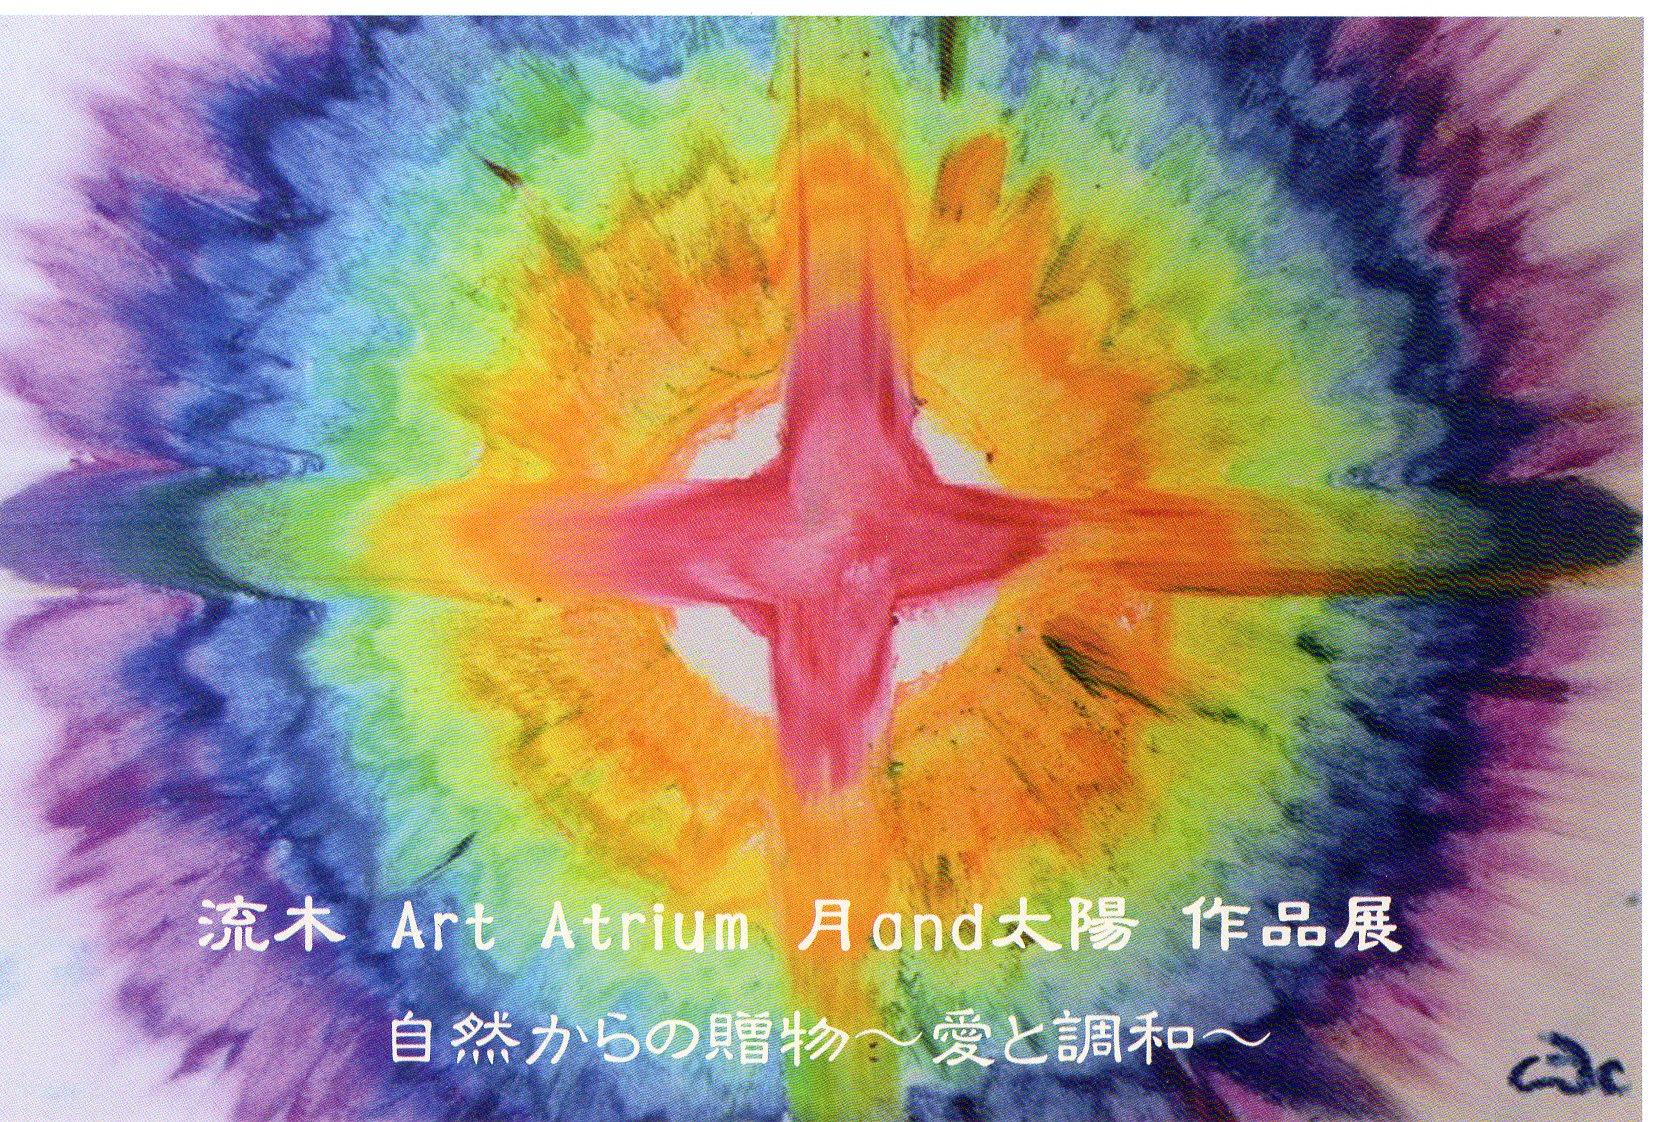 流木 Art Atrium 月and太陽 作品展